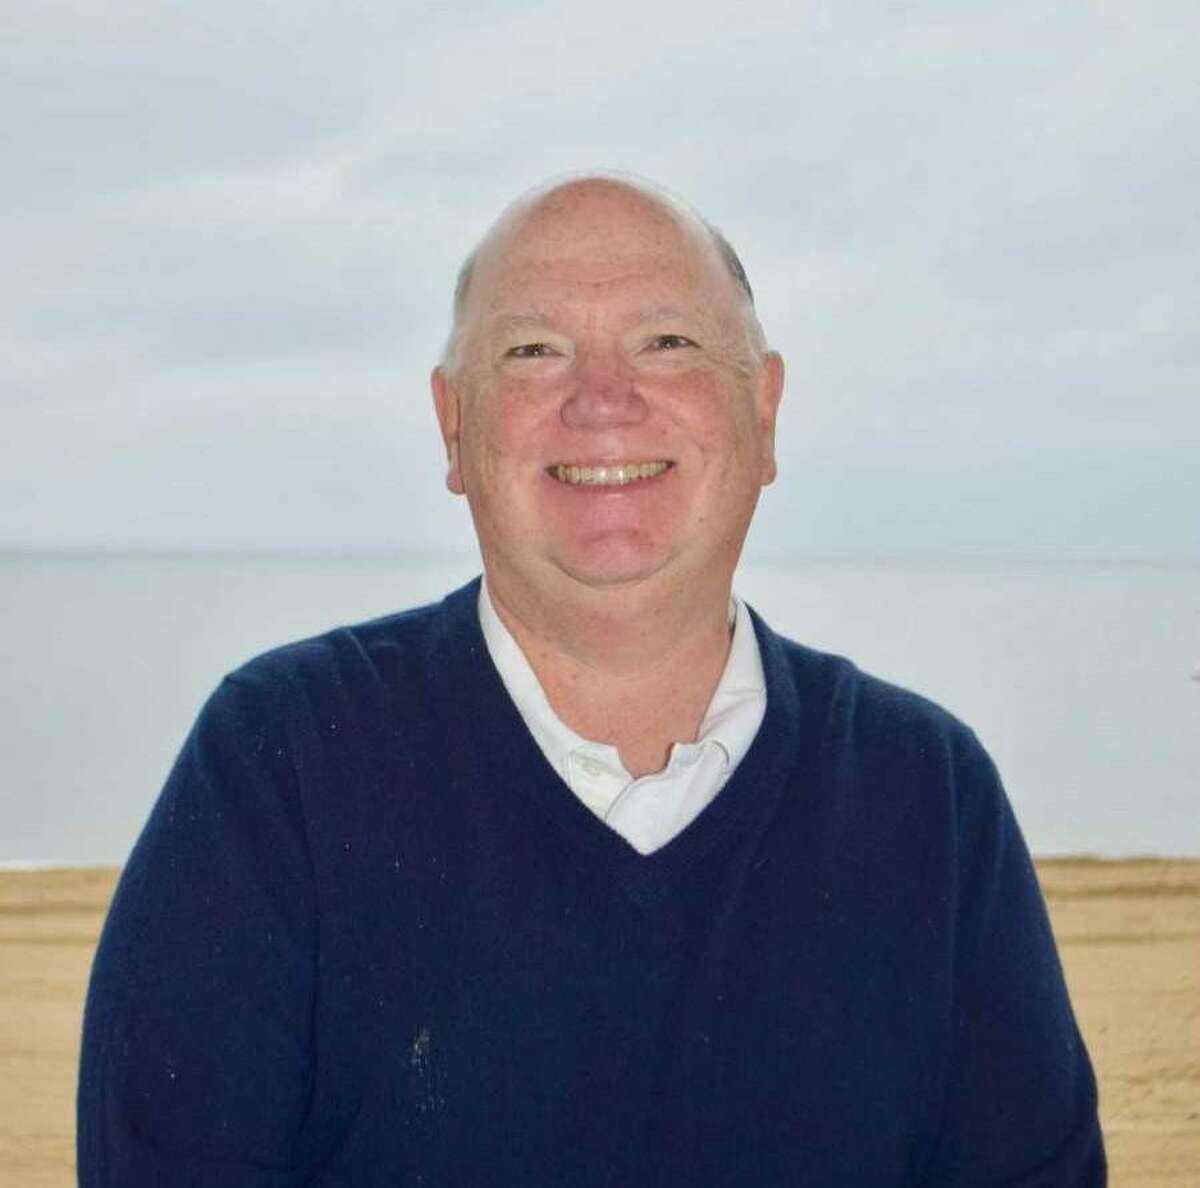 Mike Burke is running for Darien Board of Selectman in November 2021.